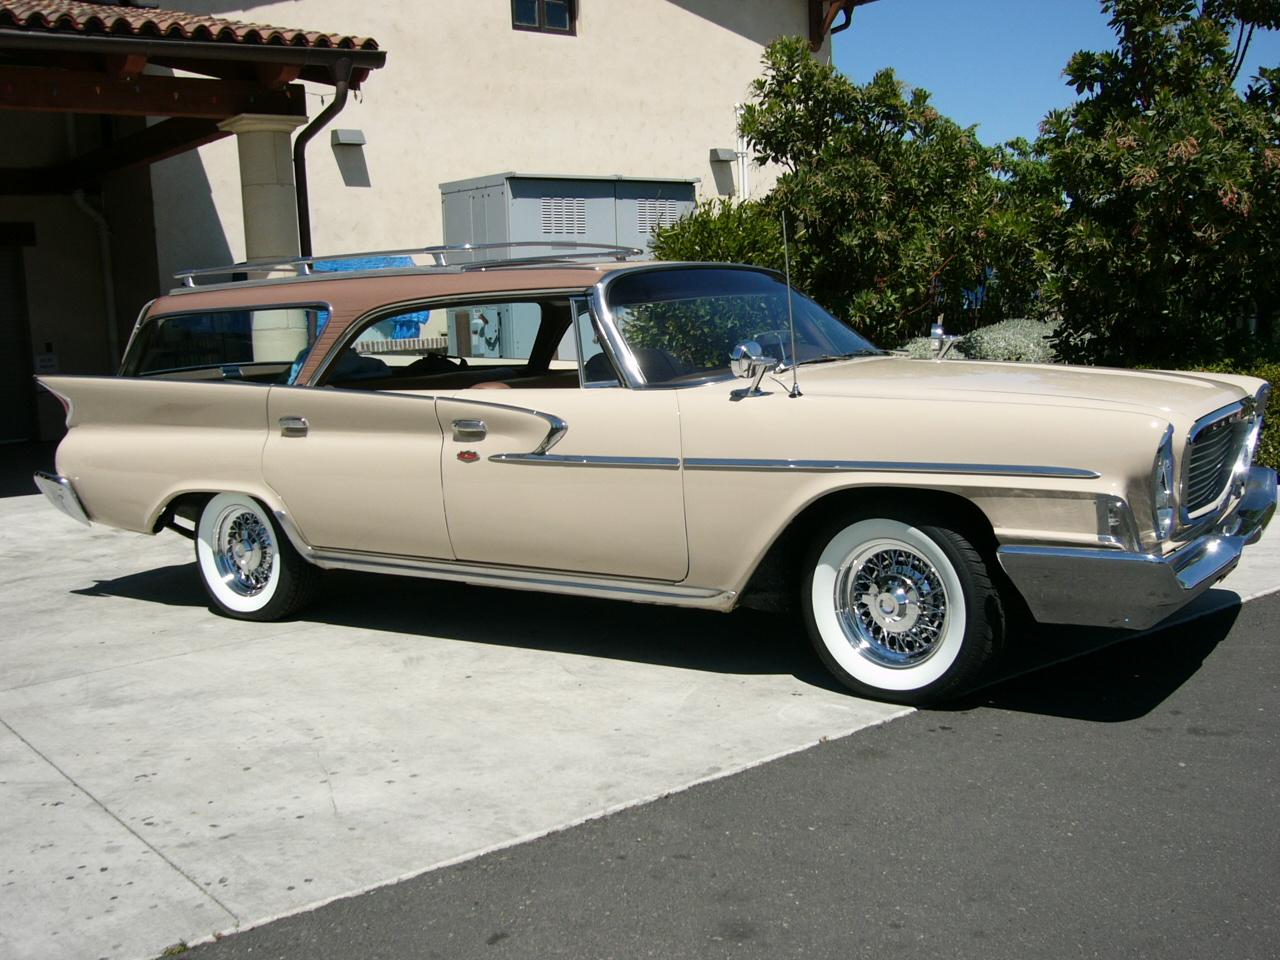 1961 Chrysler Newport wagon by